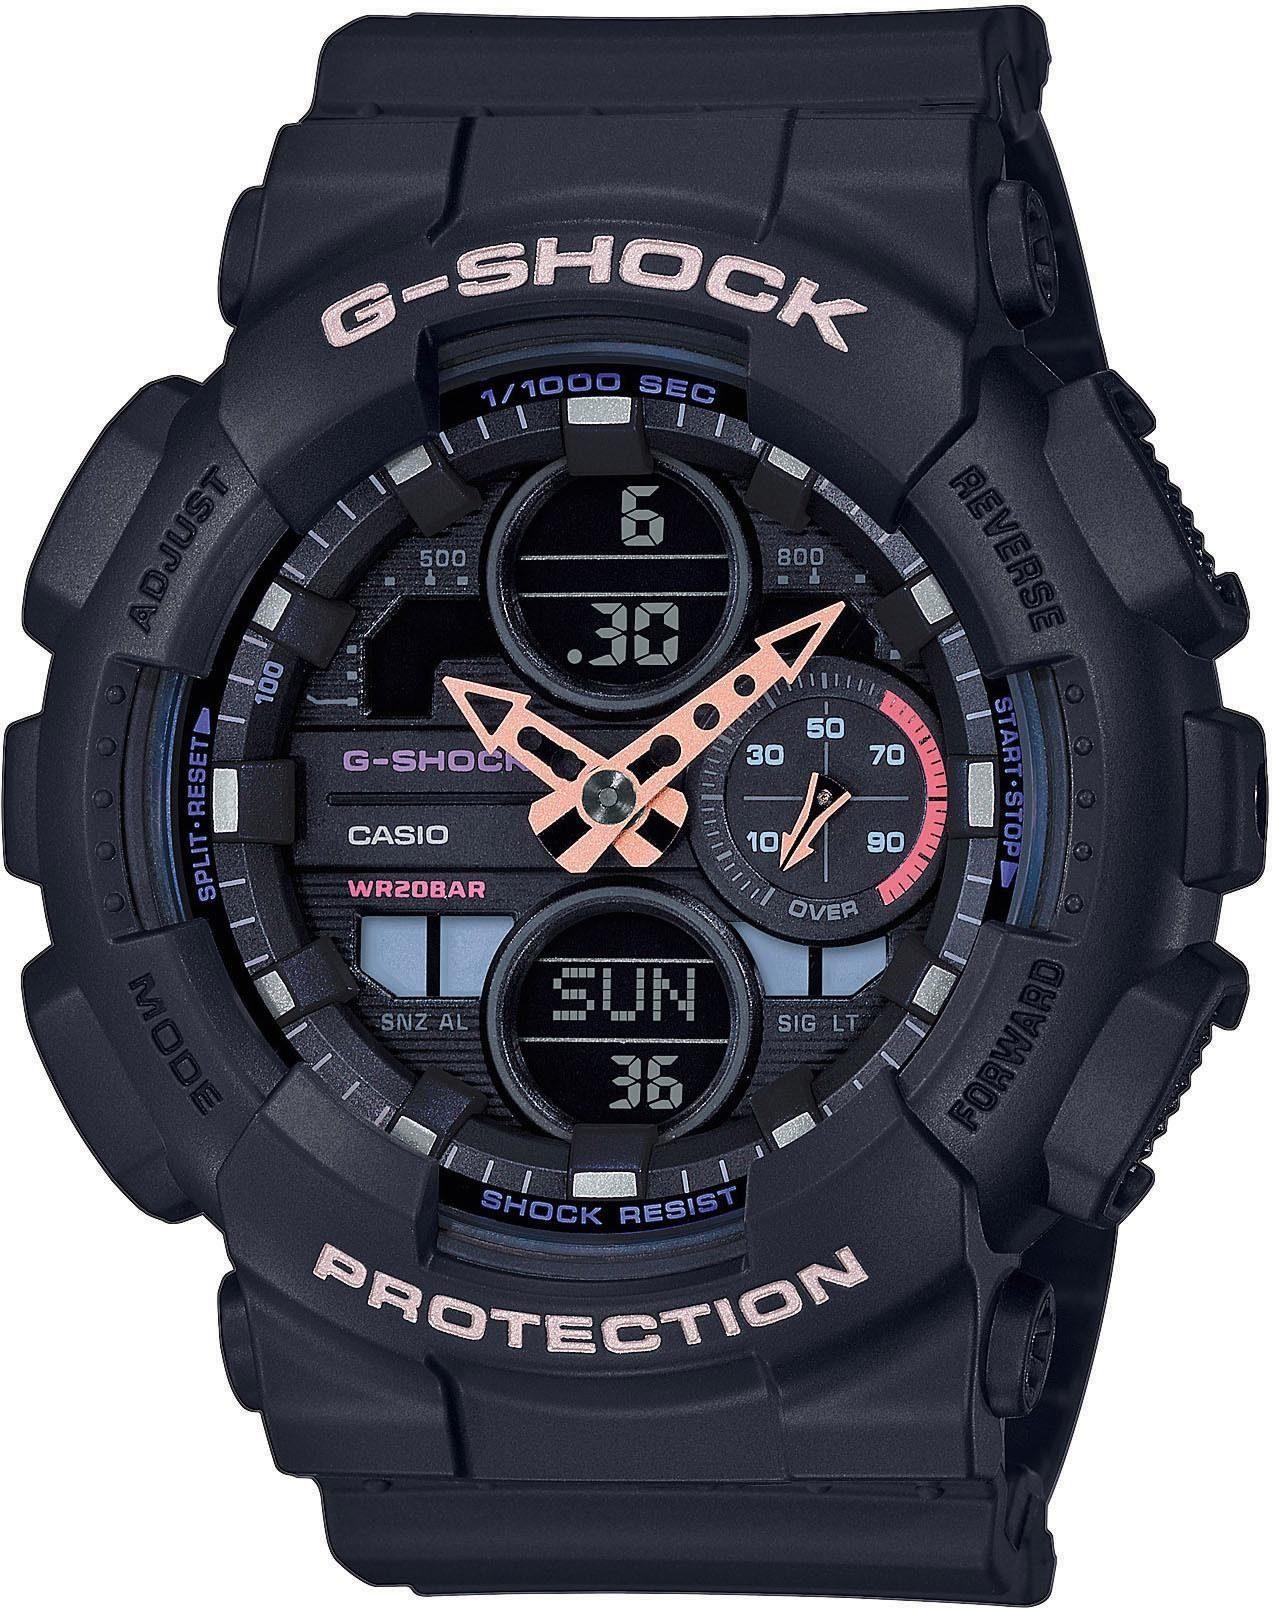 CASIO G-SHOCK Chronograph GMA-S140-1AER | Uhren > Chronographen | Casio G-Shock